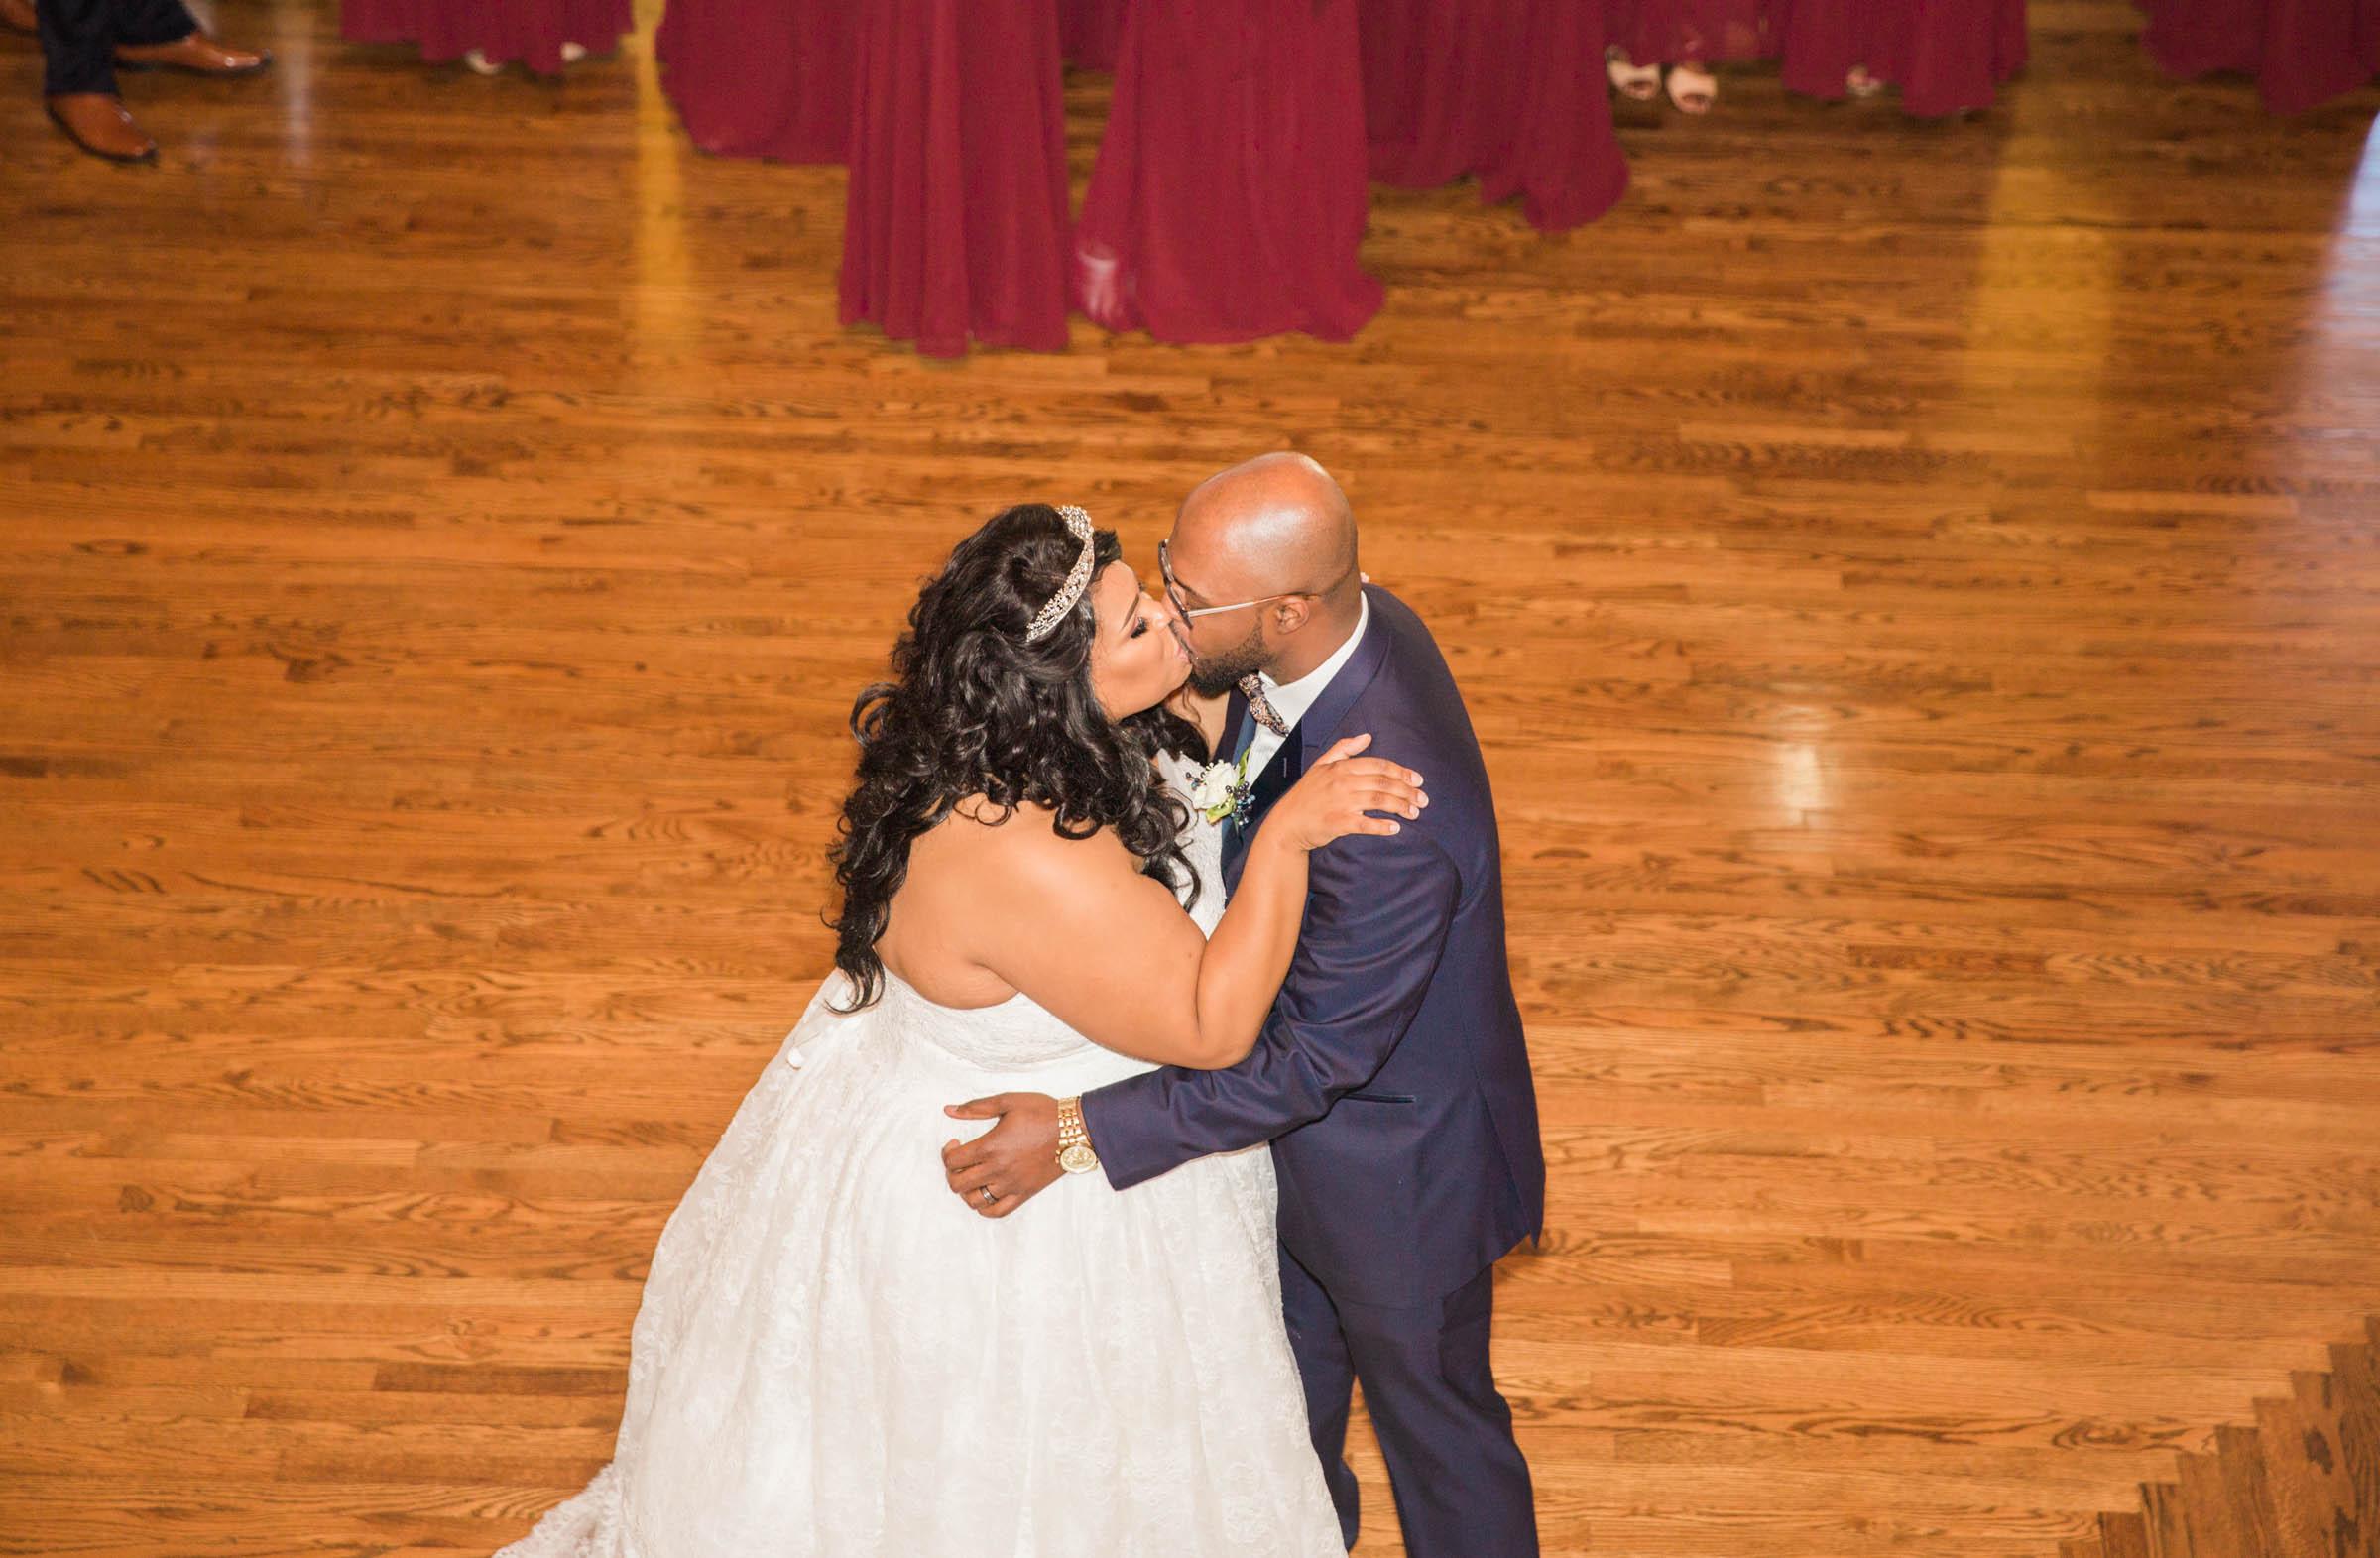 Royal Black Bride in Baltimore Preston Hall Black Wedding Photographers Megapixels Media Photography (62 of 73).jpg